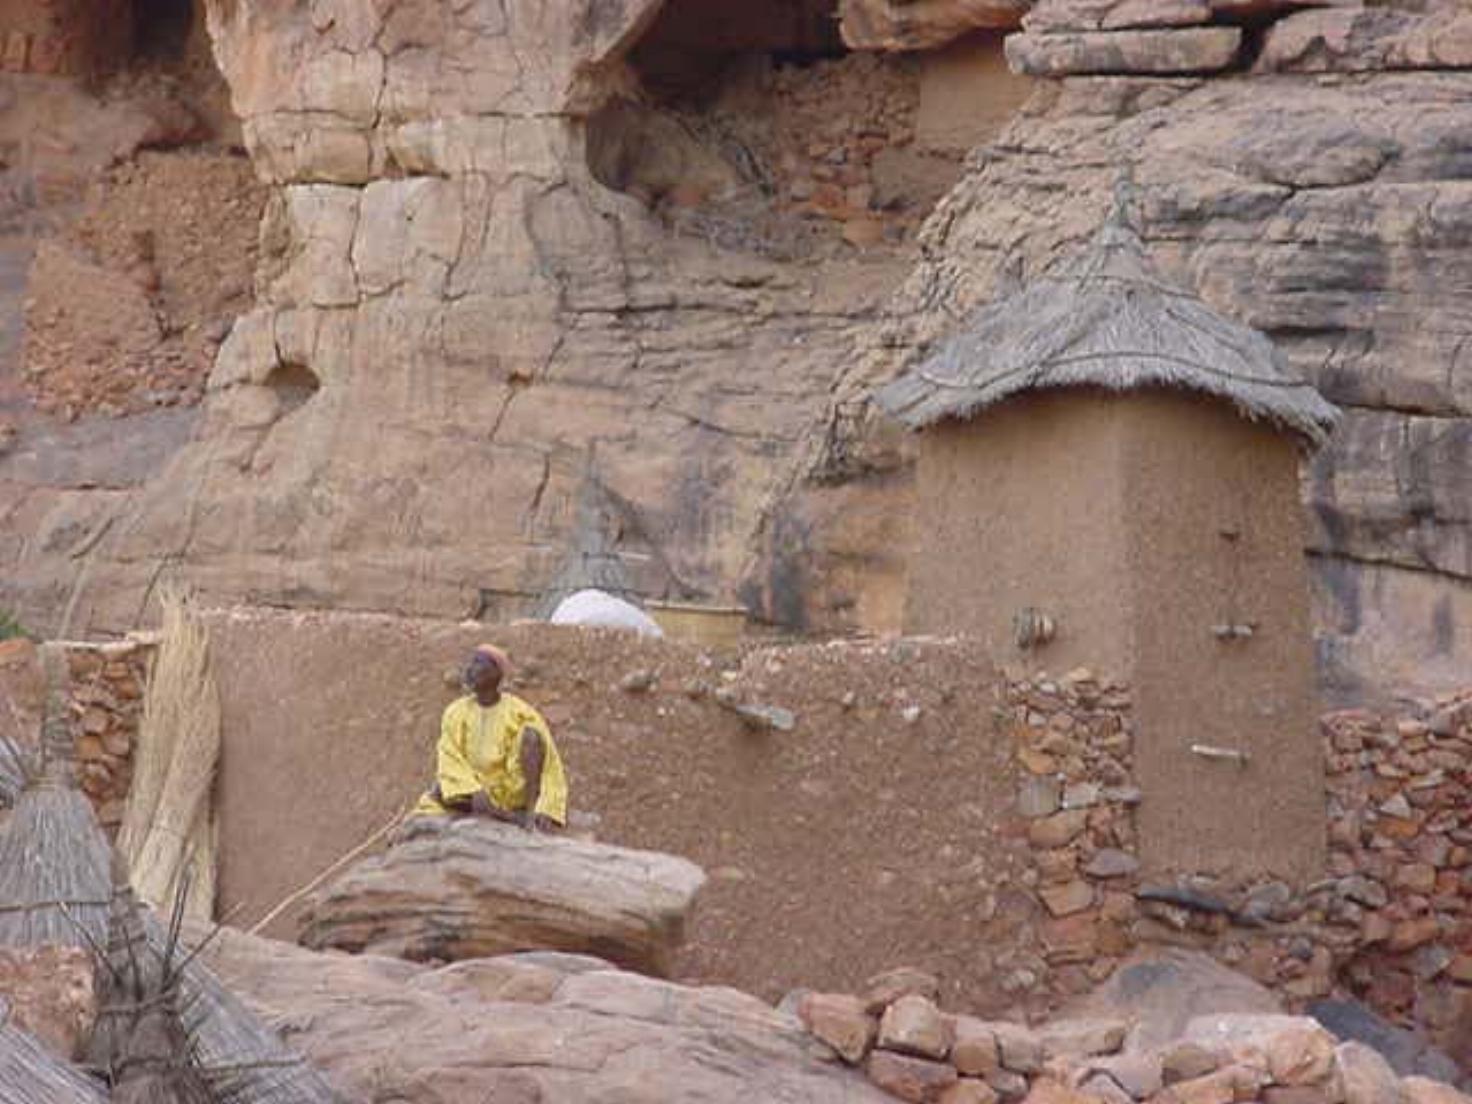 A Dogon elder